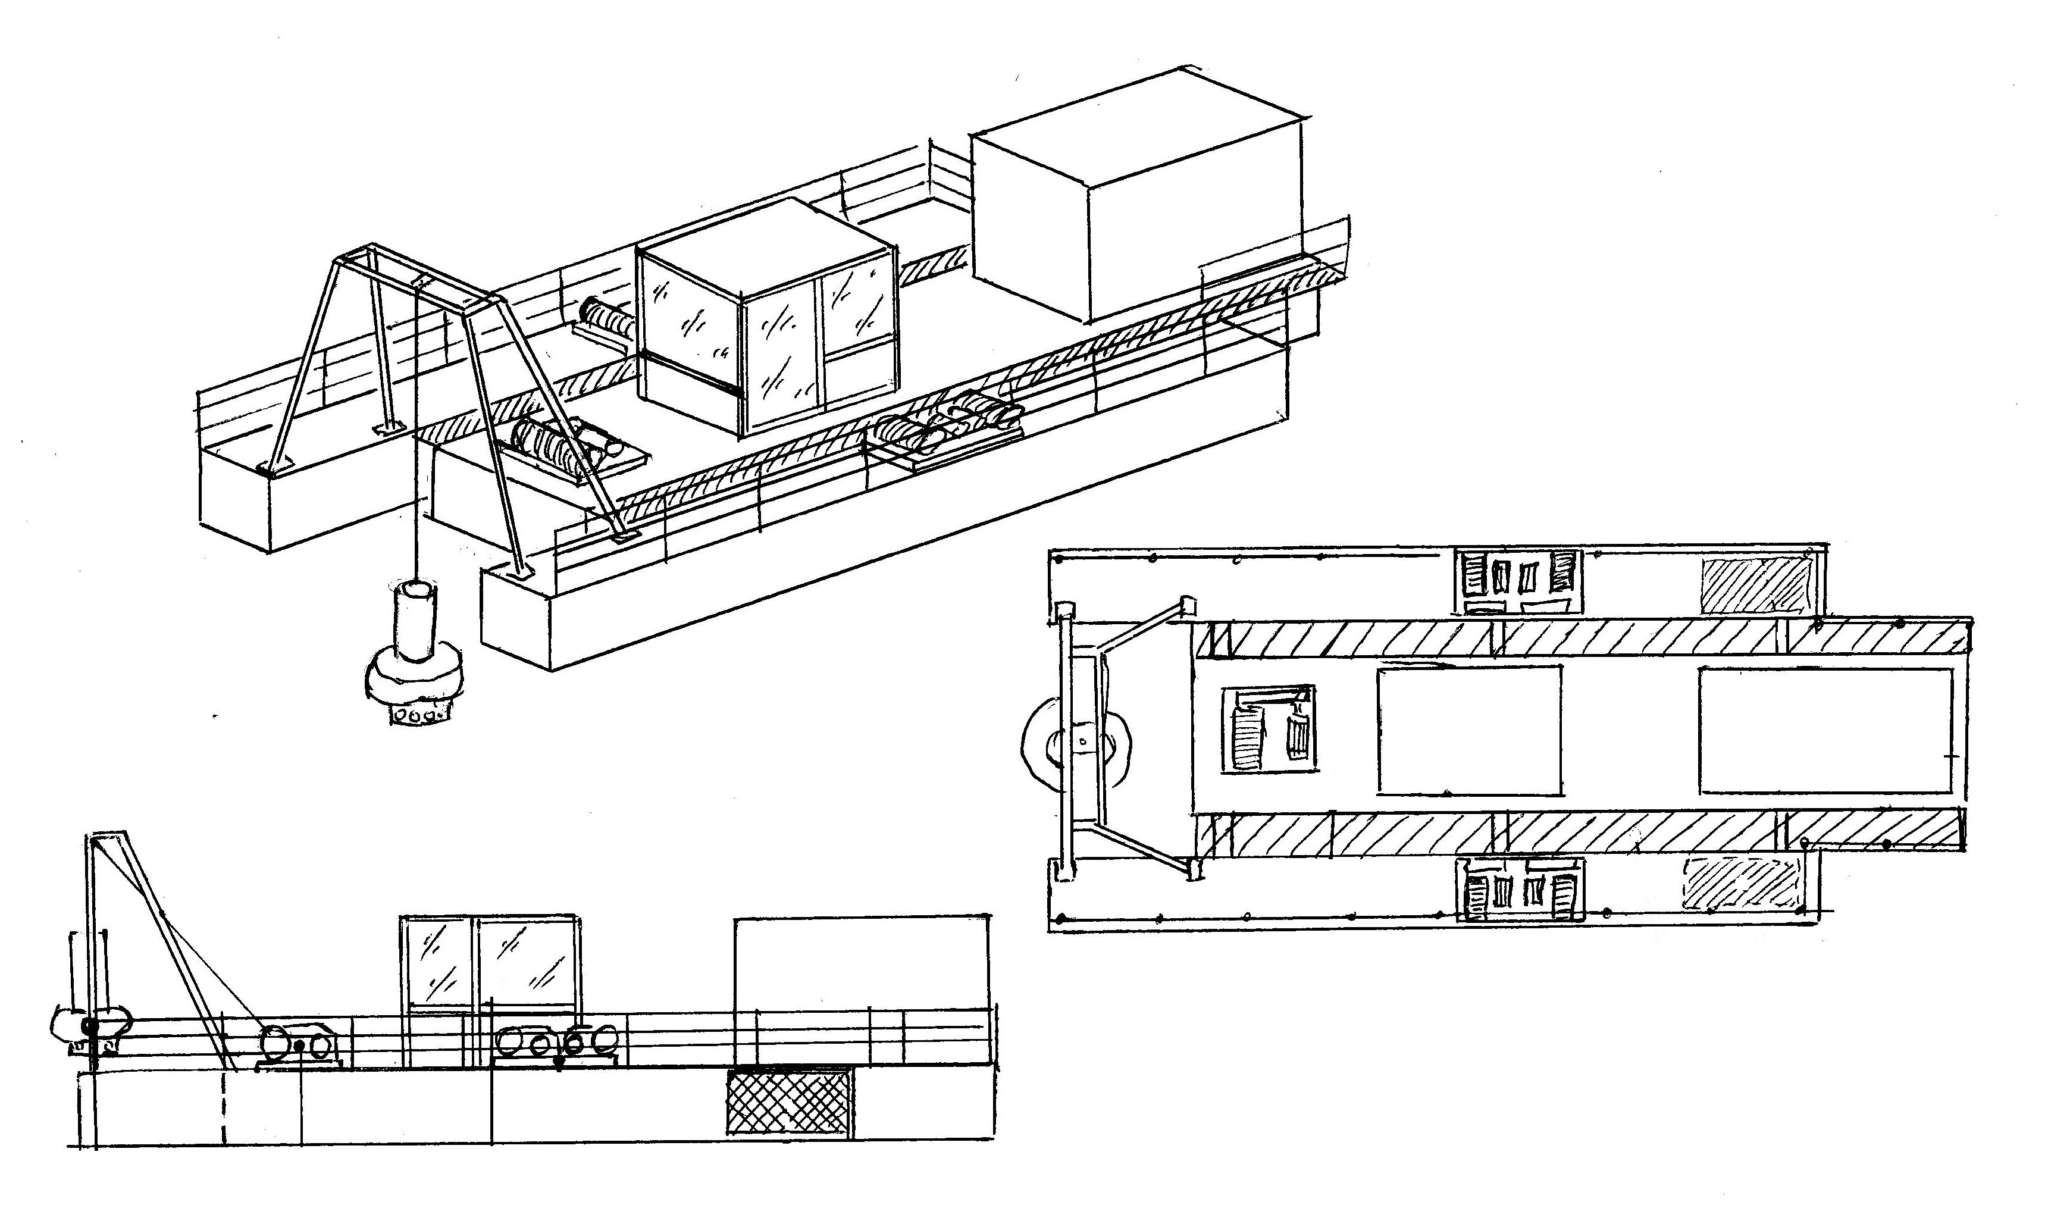 Suction Dredger Modular